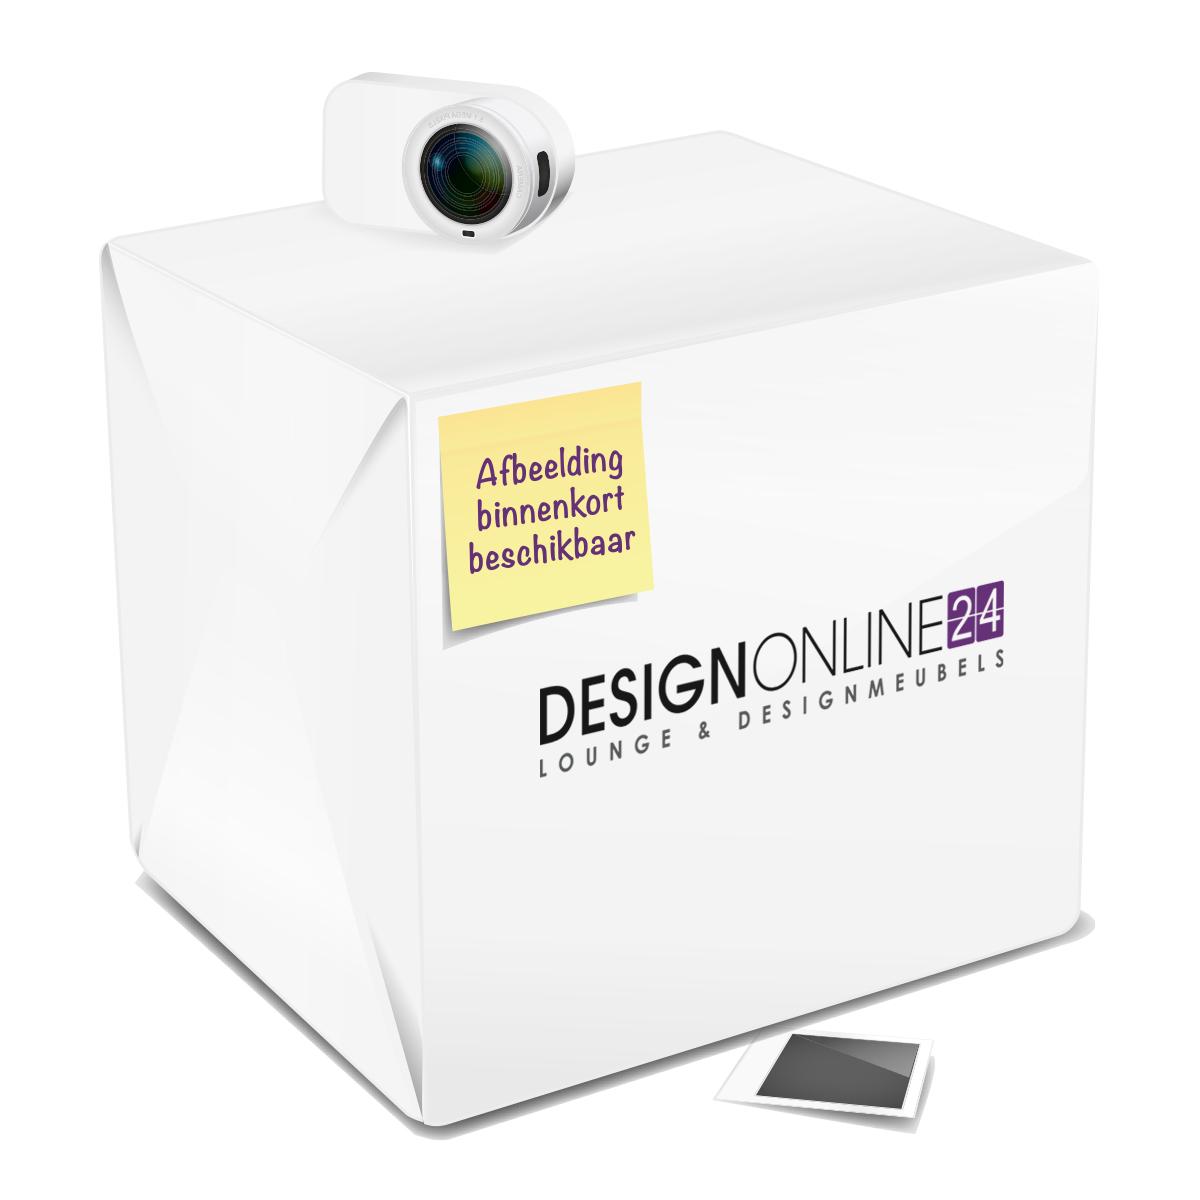 24Designs 24Designs Loungeset 6 Personen - Pomonte - Zwart Polyrattan Wicker met Donkergrijze kussens